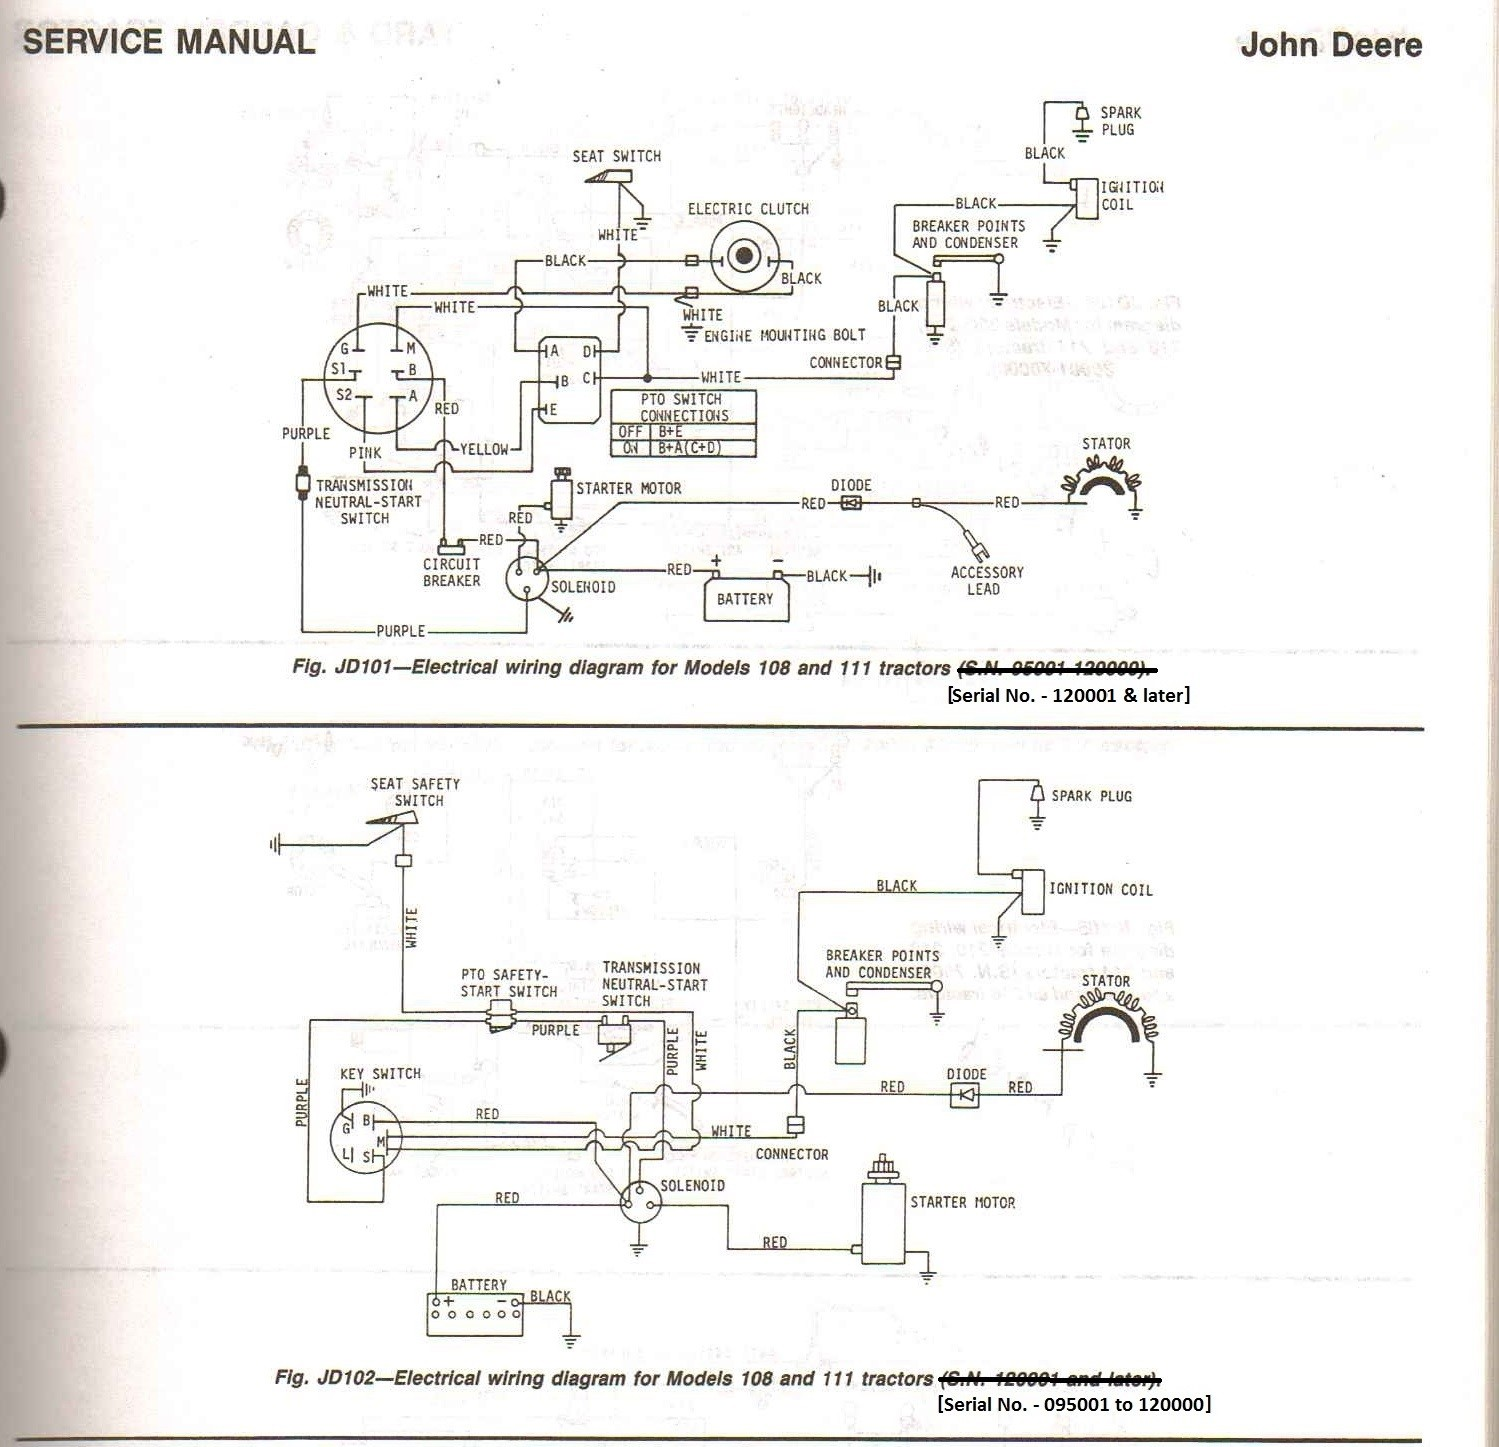 John Deere 345 Lawn Tractor Wiring Diagram Diagram] John Deere 735 Wiring Diagram Full Version Hd Of John Deere 345 Lawn Tractor Wiring Diagram